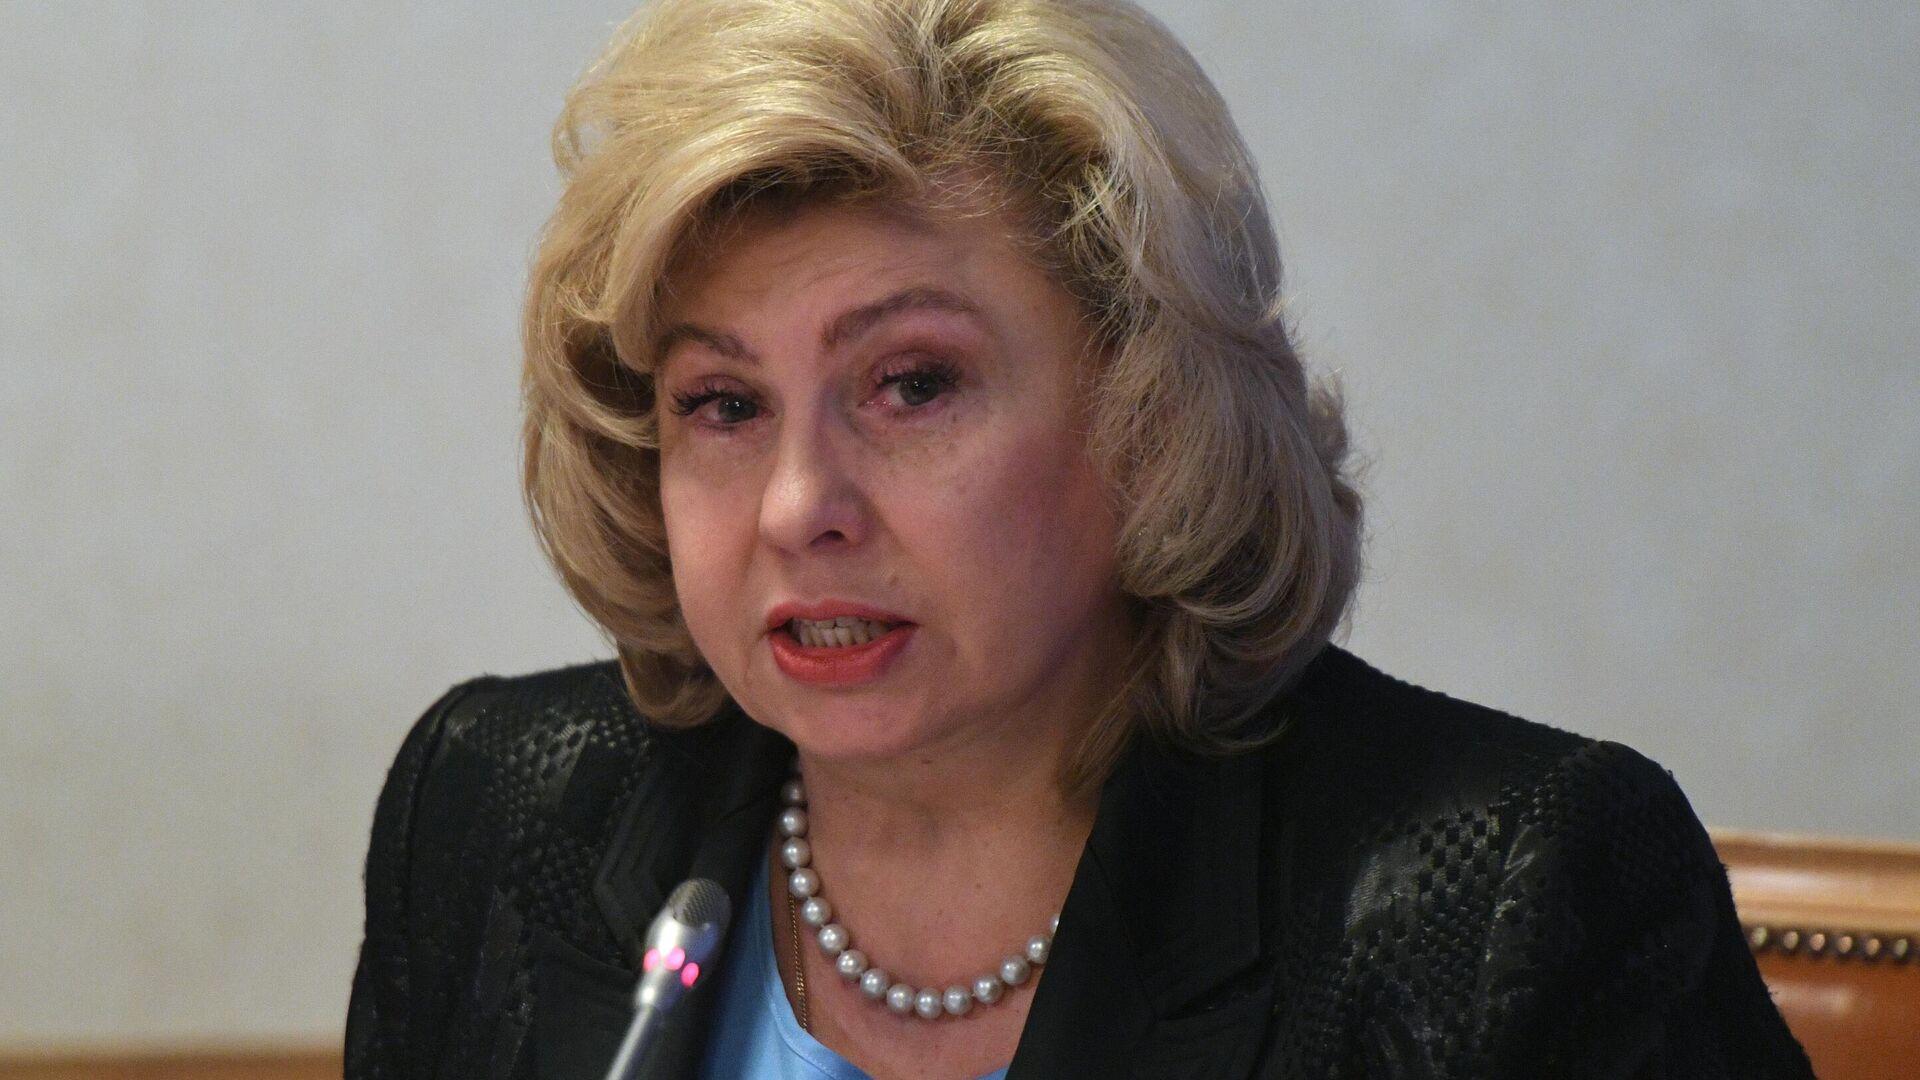 ВС освободил пенсионерку от уголовного наказания по запросу омбудсмена